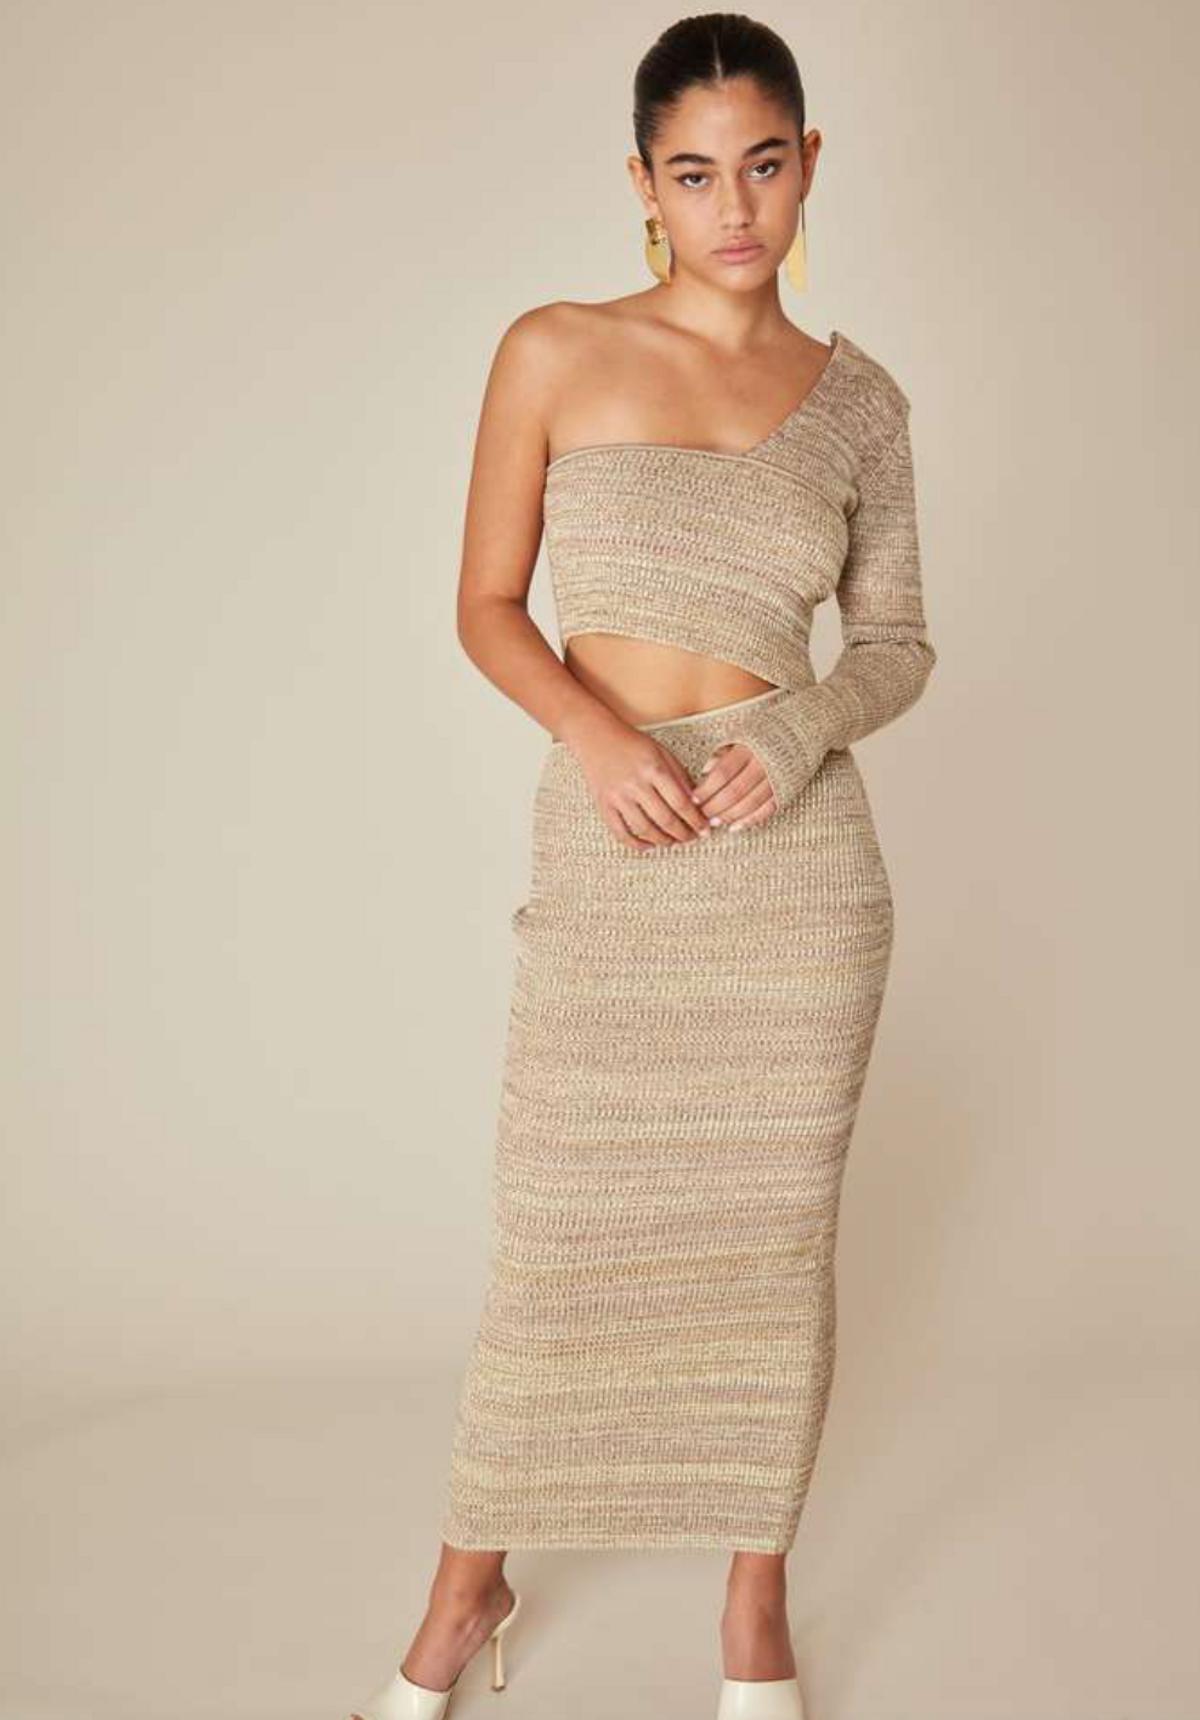 Lorraine Knit Dress